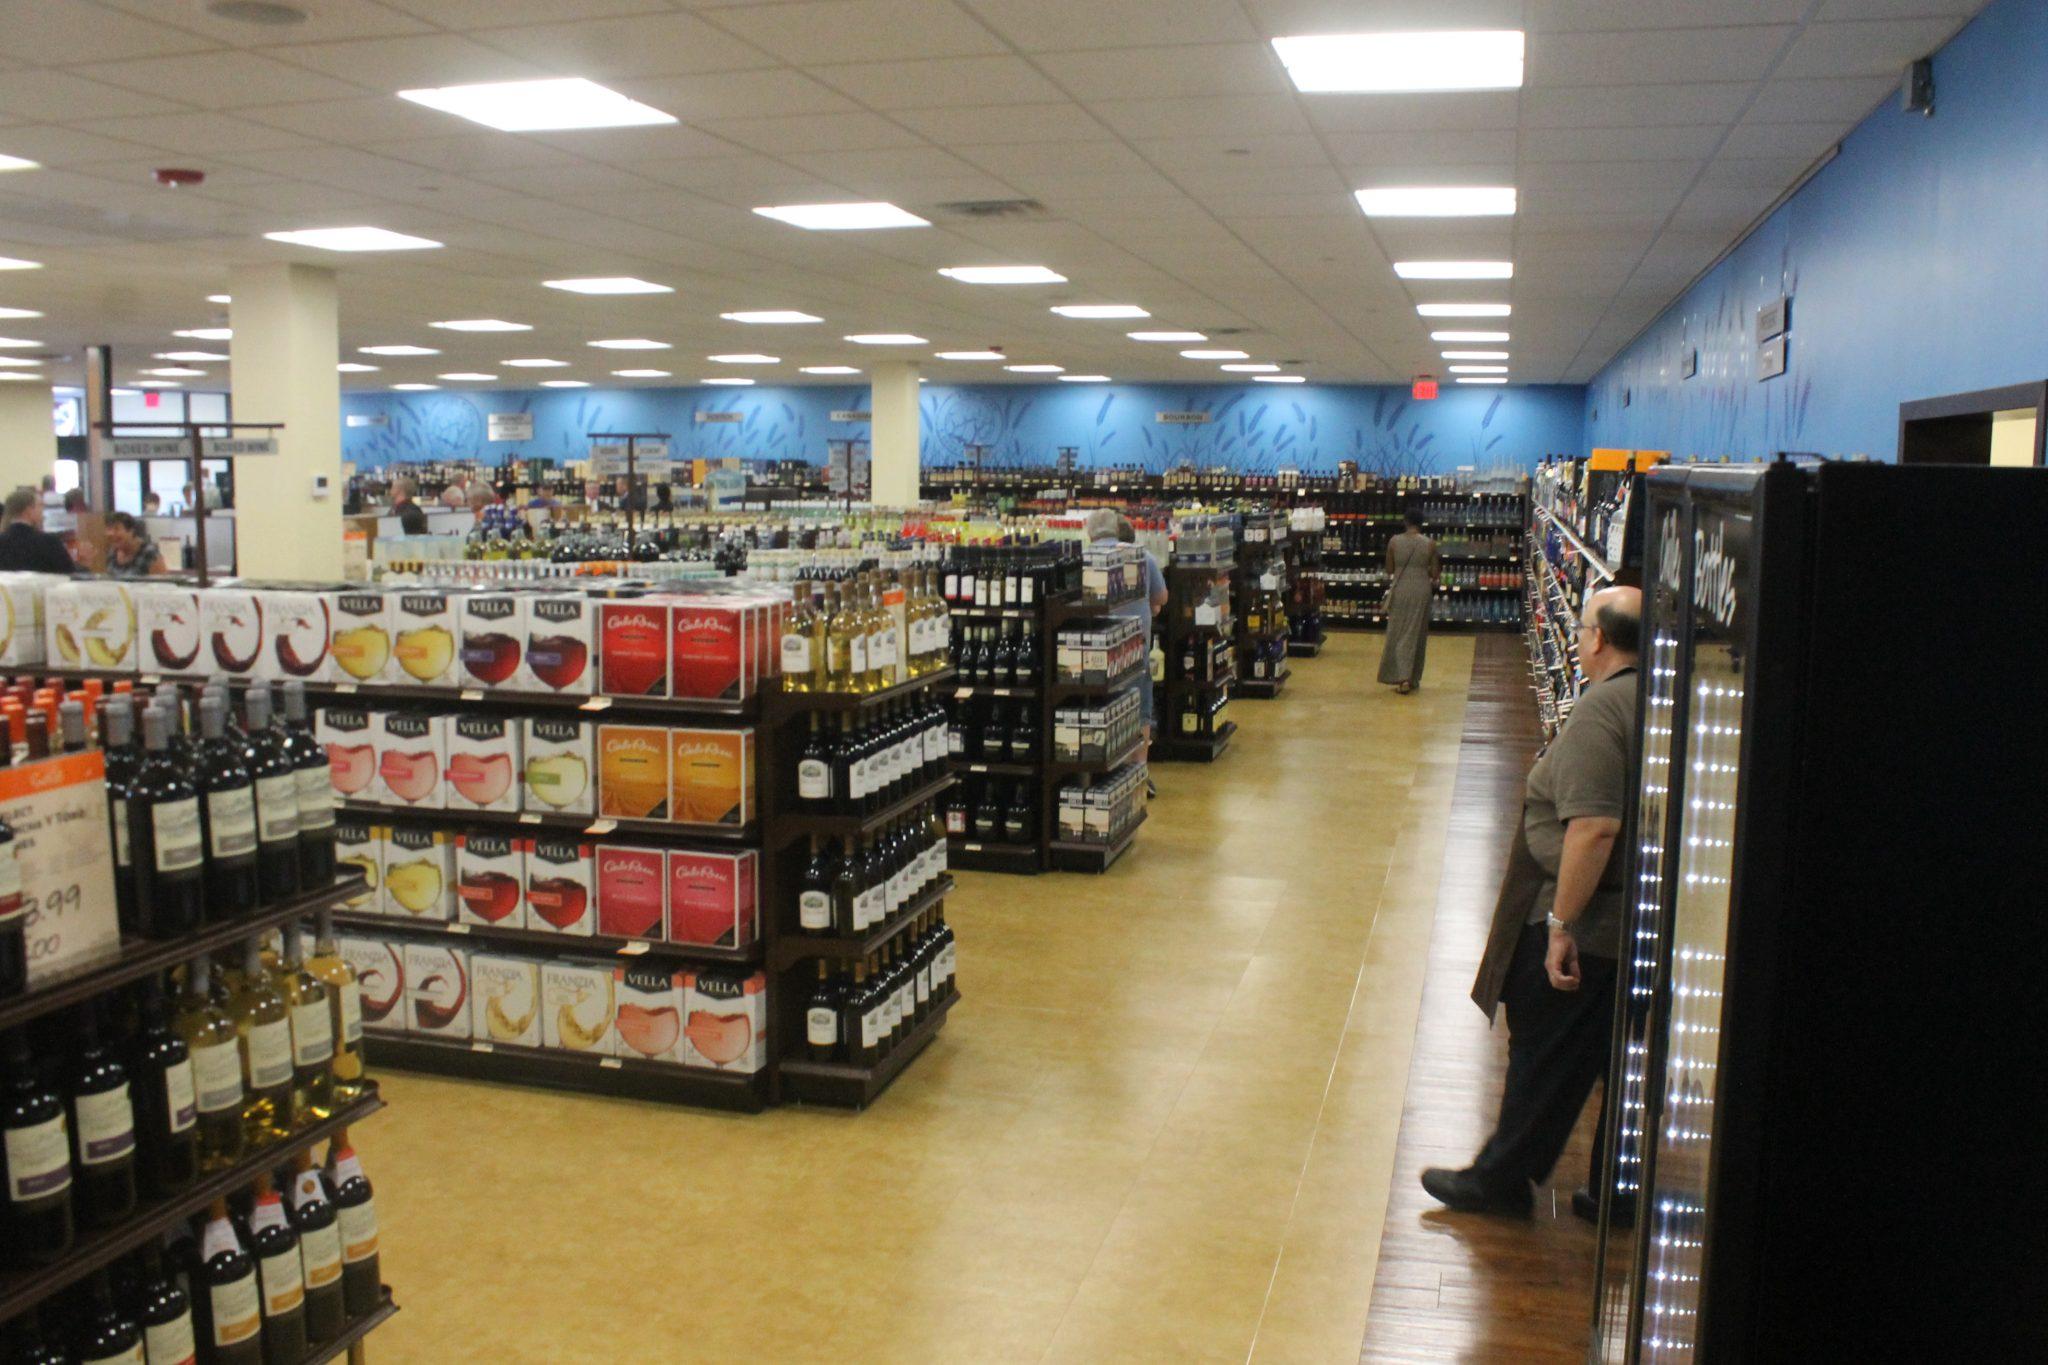 Soft Open Of Liquor Stores Uncertain For Now Levittownnow Com